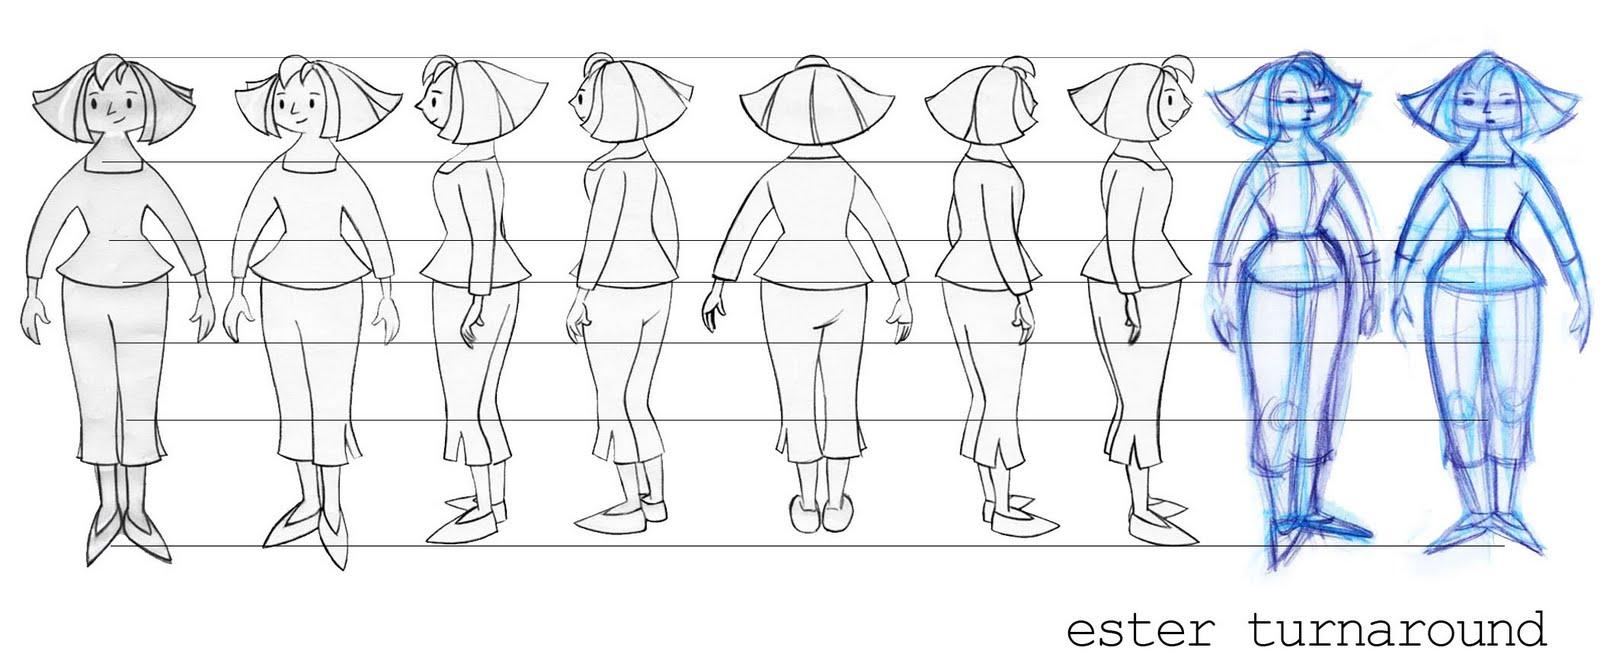 Cartoon Character Design Sheet : Cartoon character turnaround sheets sex porn images